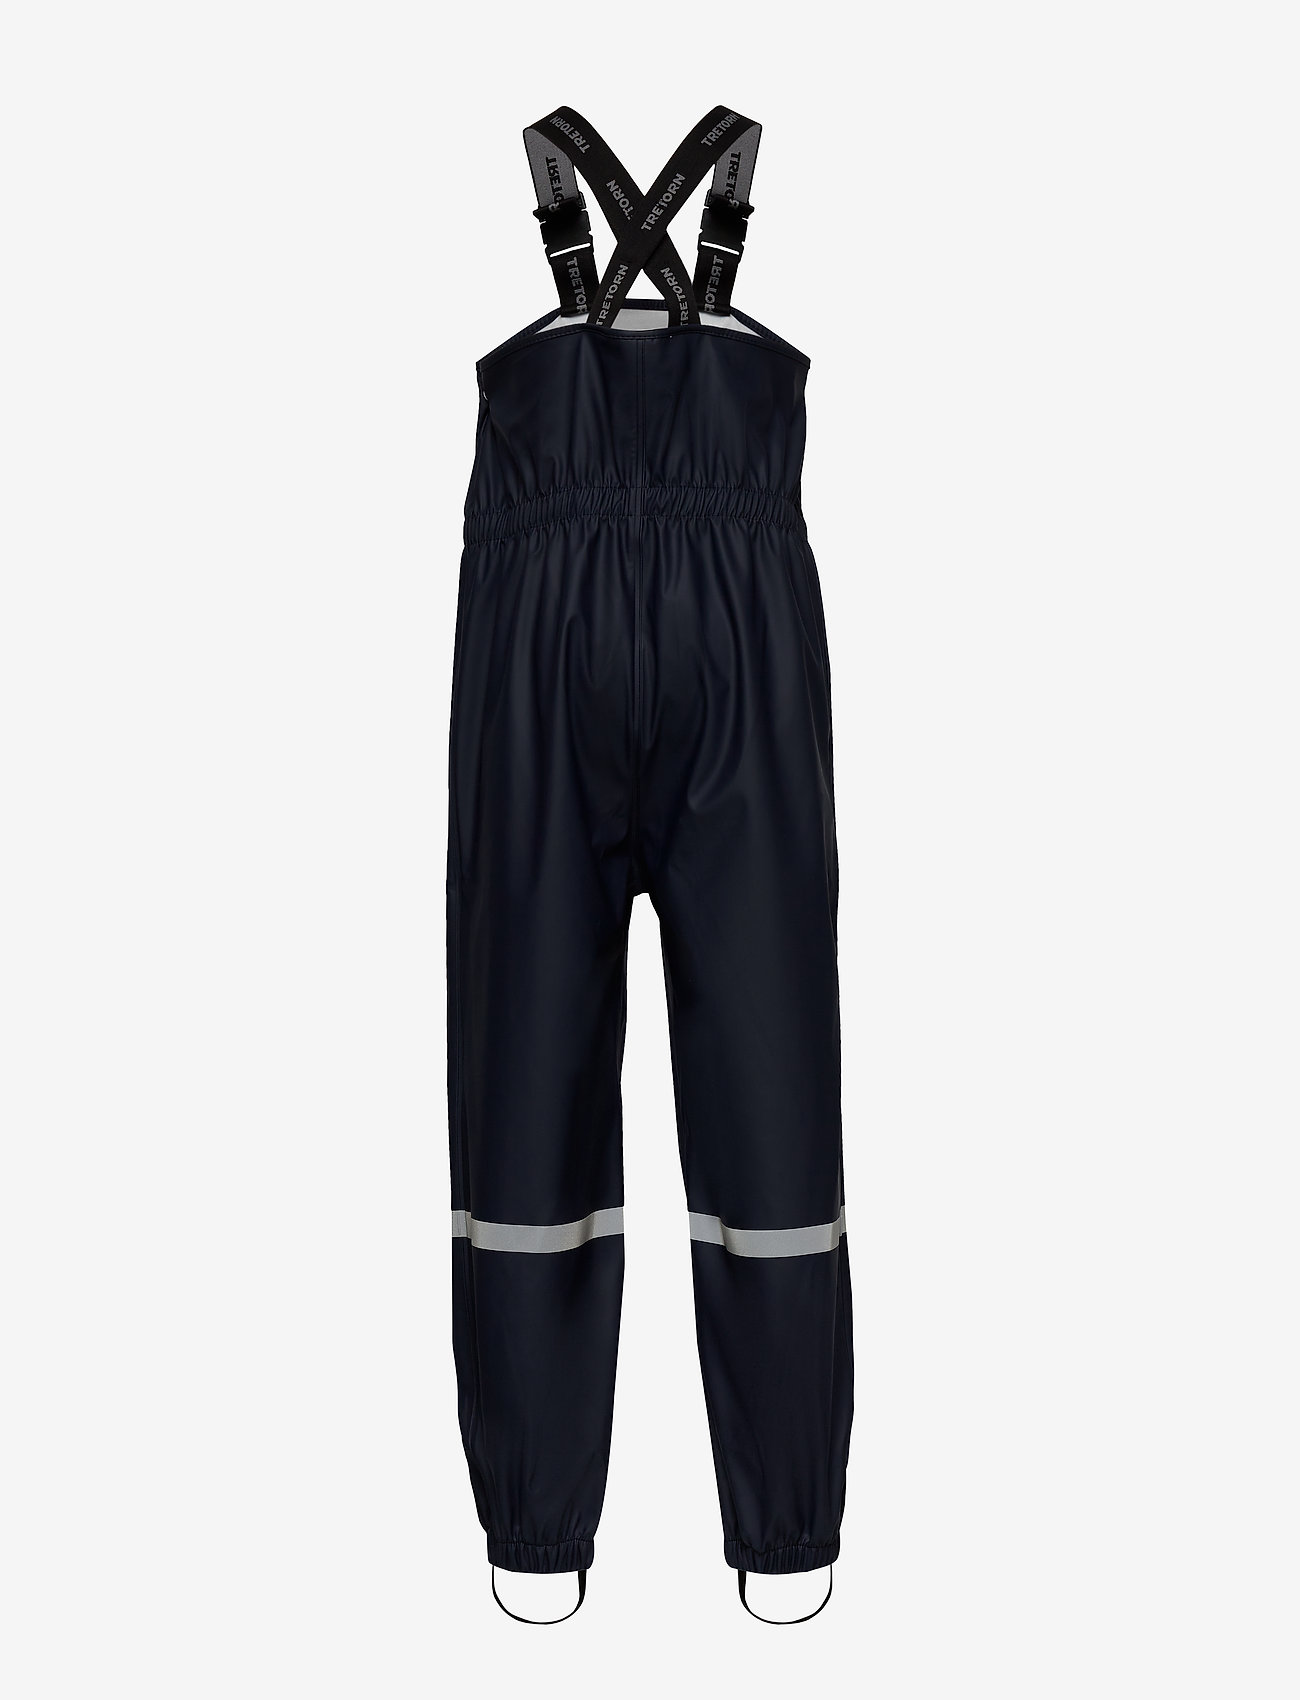 Tretorn - KIDS WINGS HIGH RAINPANTS - pantalons - 080/navy - 1